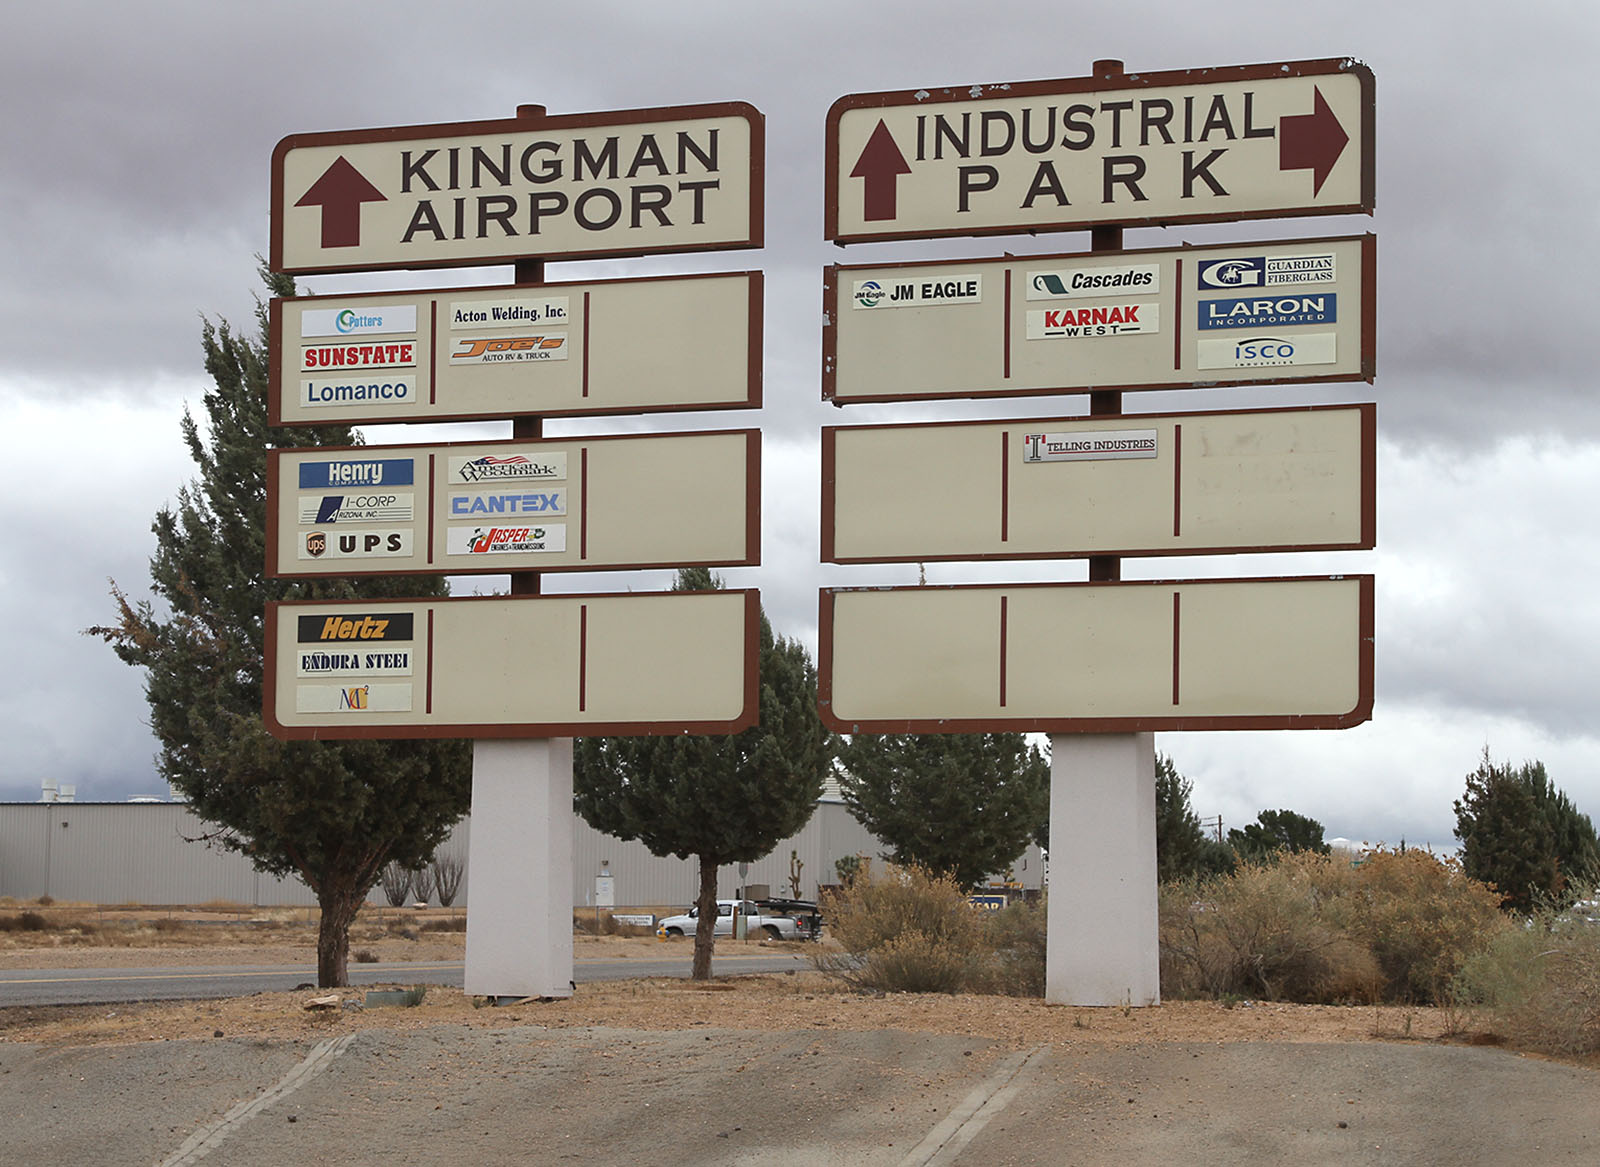 Industrial park signage discussions continue | Kingman Daily Miner |  Kingman, AZ